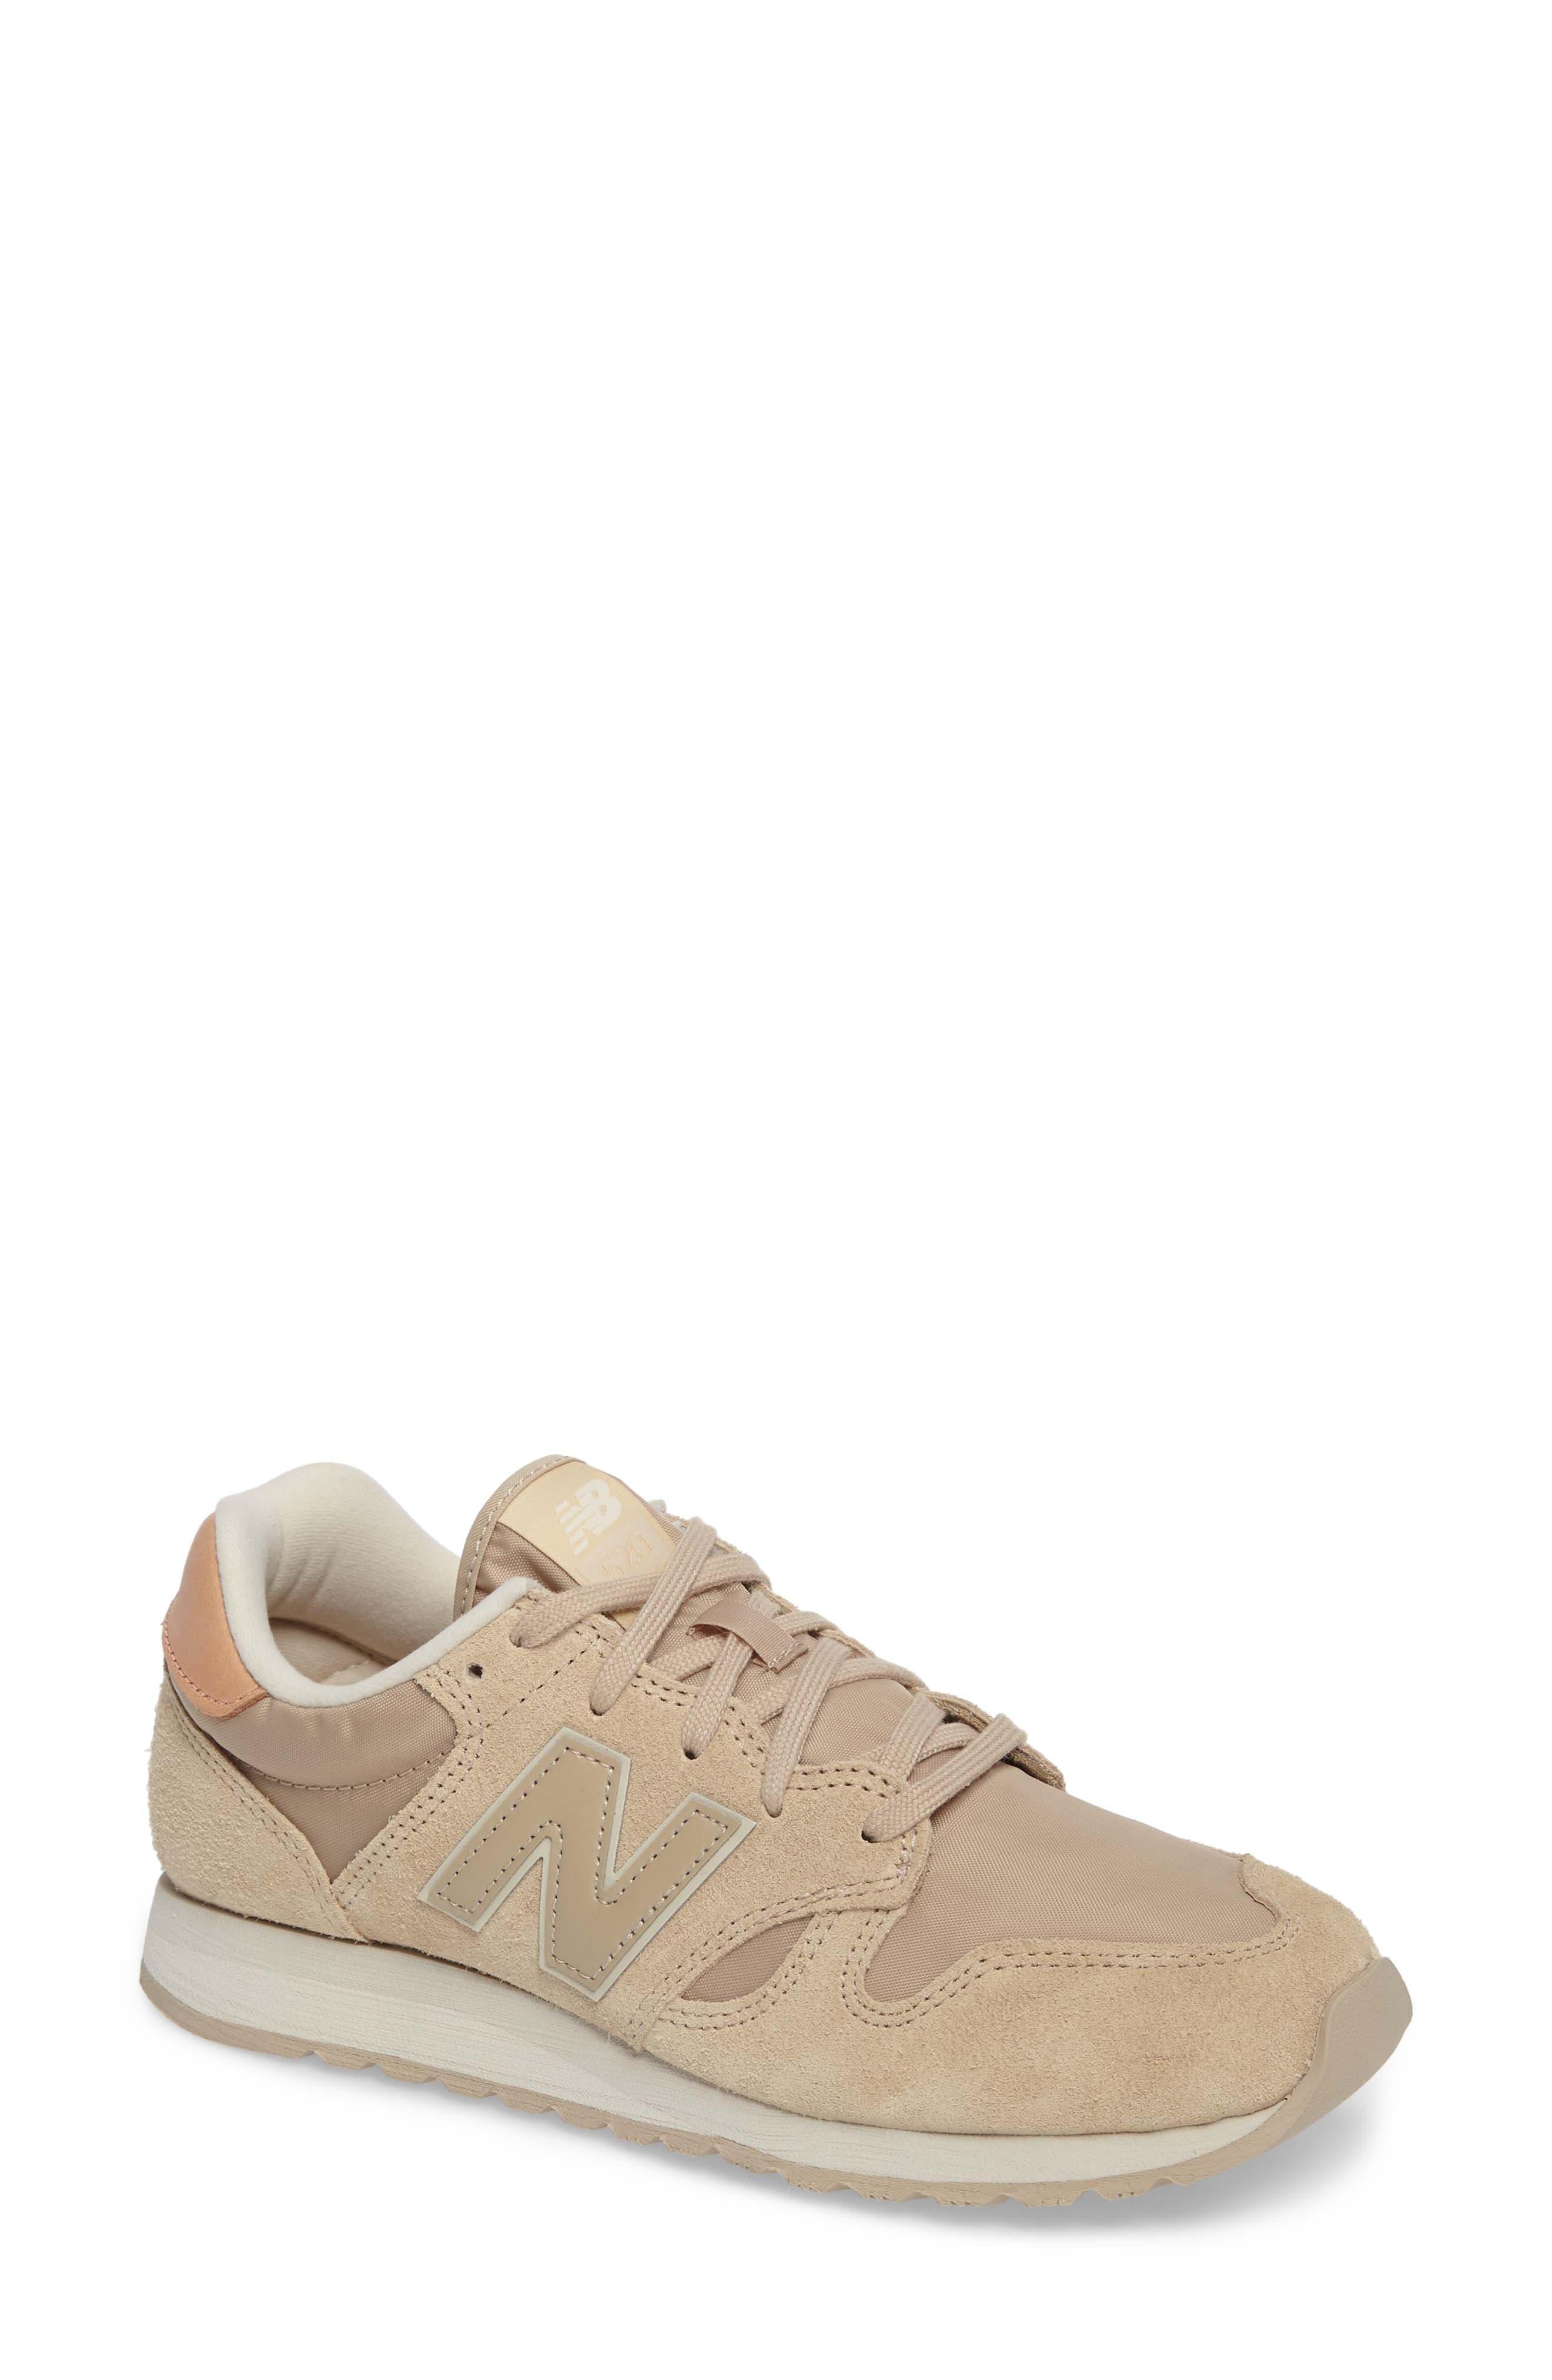 New Balance 520 Sneaker (Women)